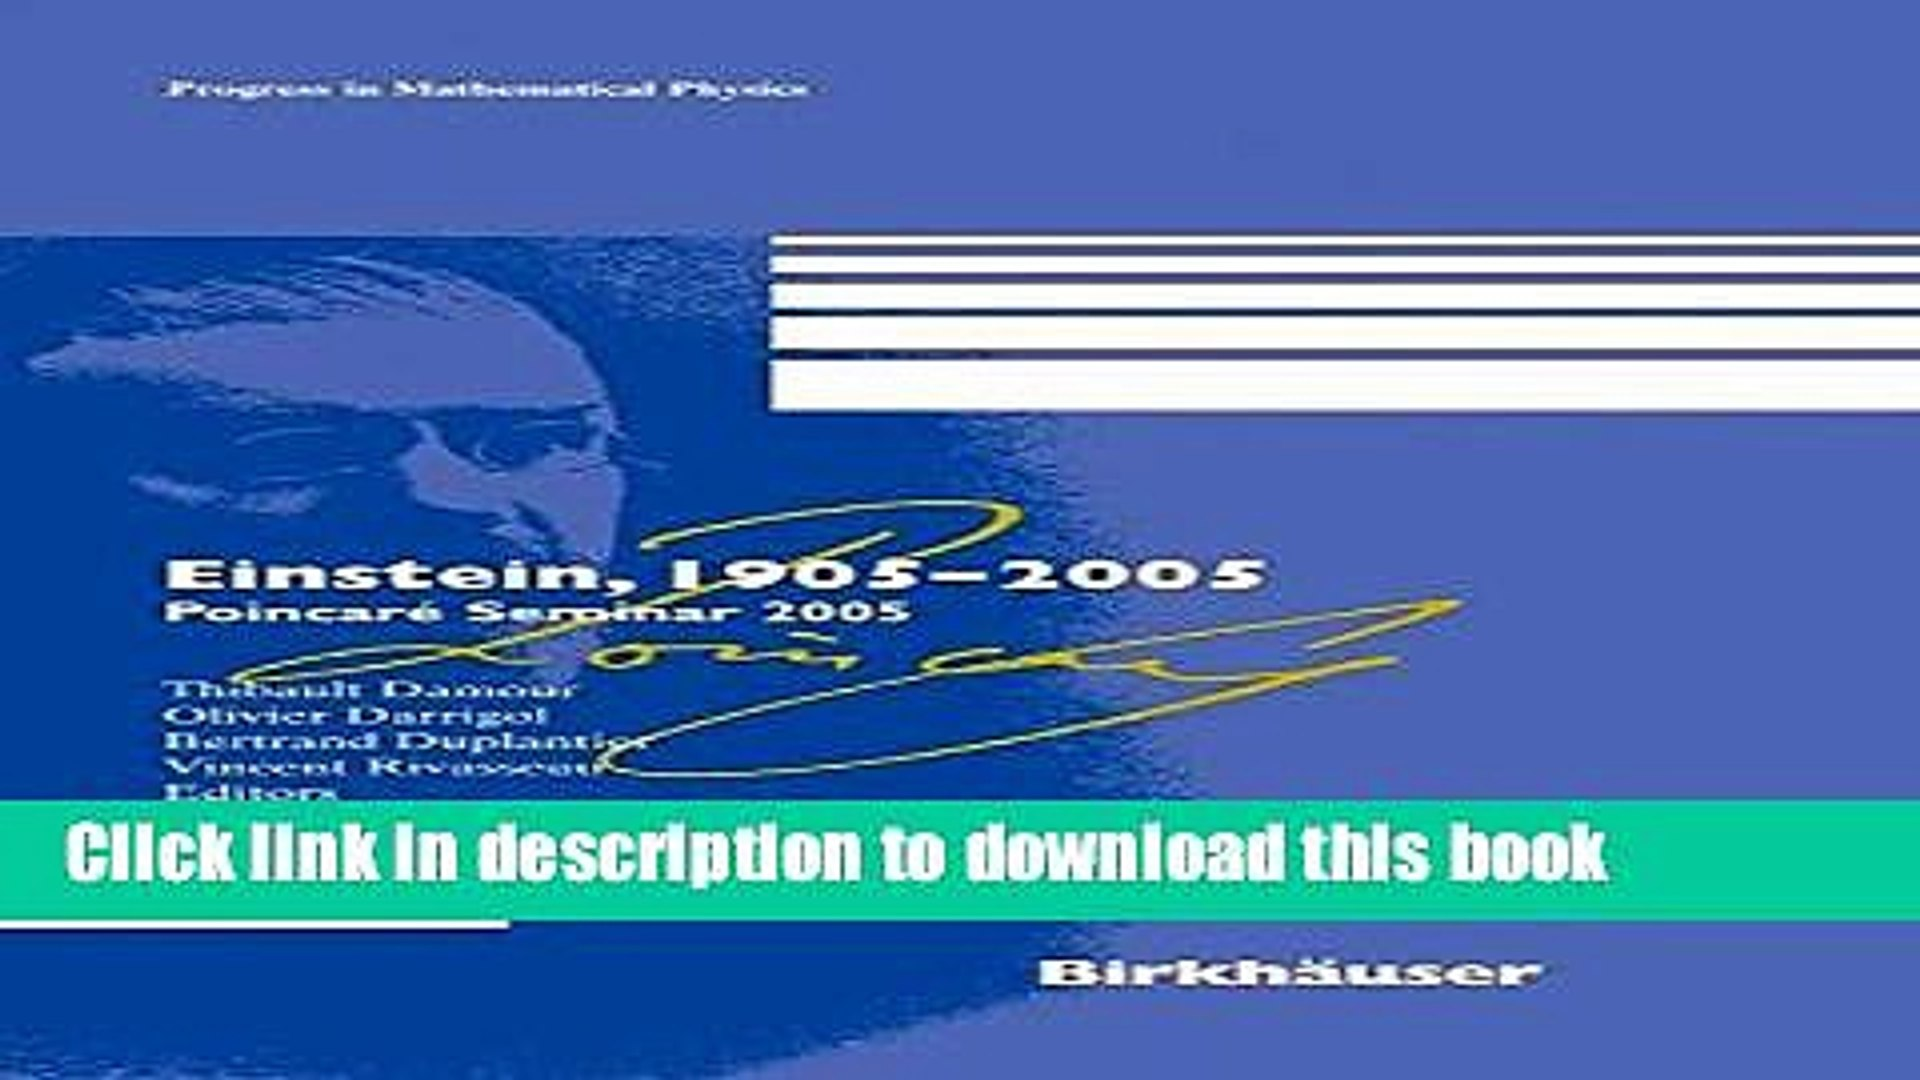 [Download] Einstein, 1905-2005: Poincaré Seminar 2005 (Progress in Mathematical Physics) Kindle